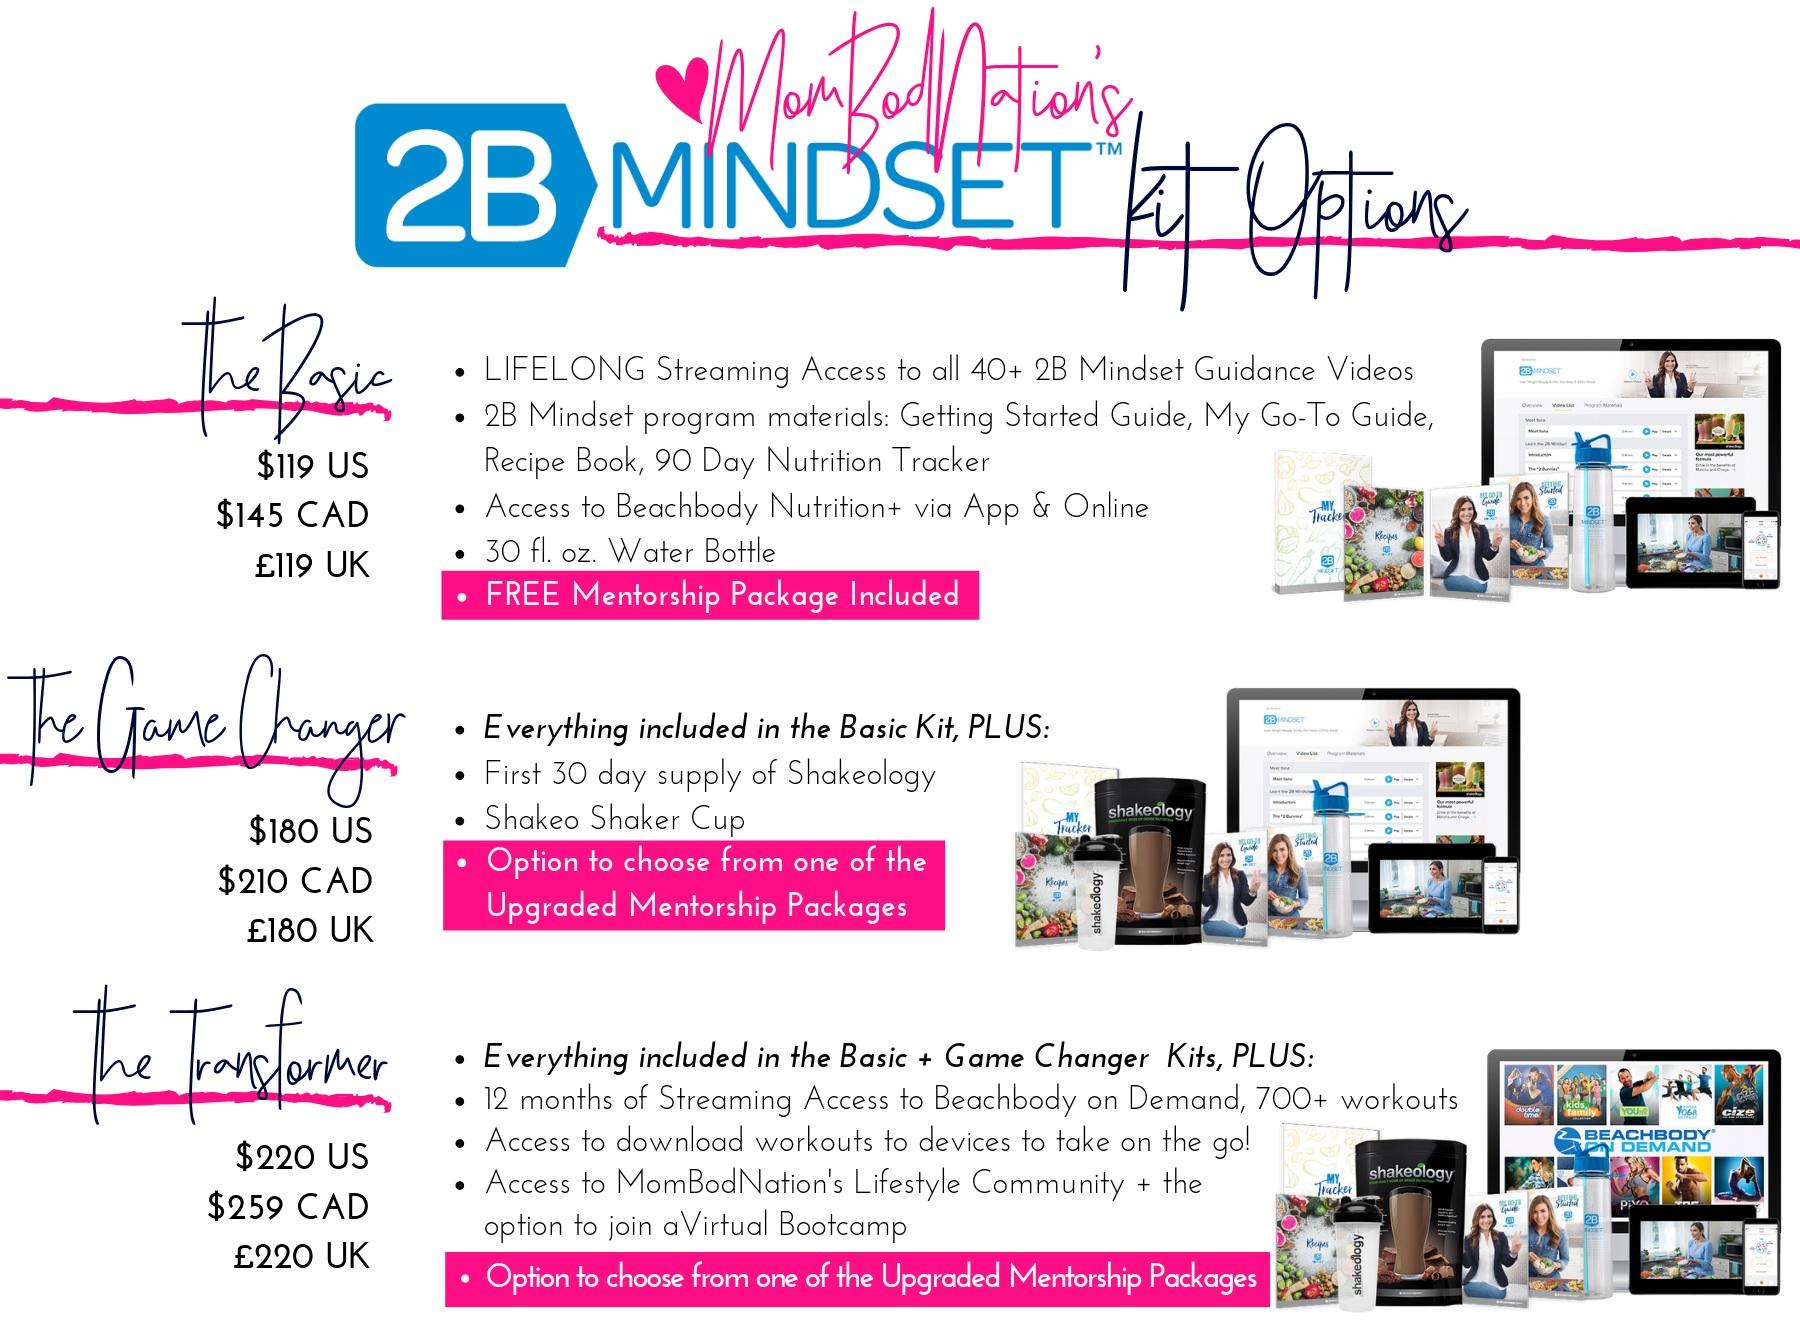 2B+Mindset+Pack+Options+%283%29.jpg